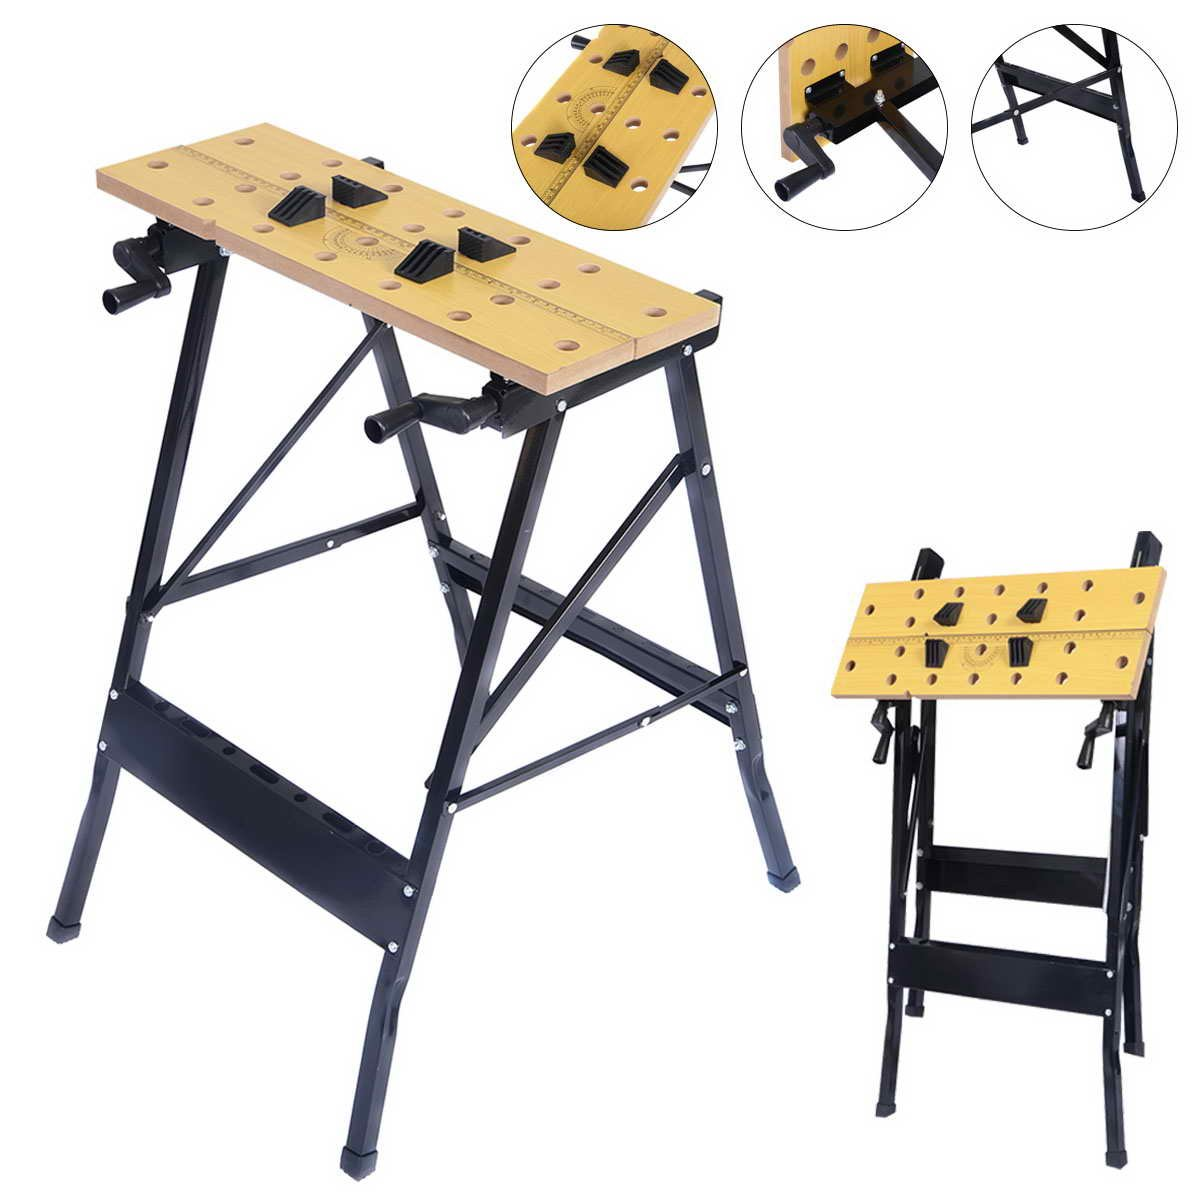 Portable Multipurpose Workbench Table Folding - Toolsempire Adjustable Work Table Sawhorse Vise Heavy Duty Stainless Steel Legs Lightweight Repair Tools For Workshop Light Work by Toolsempire (Image #1)